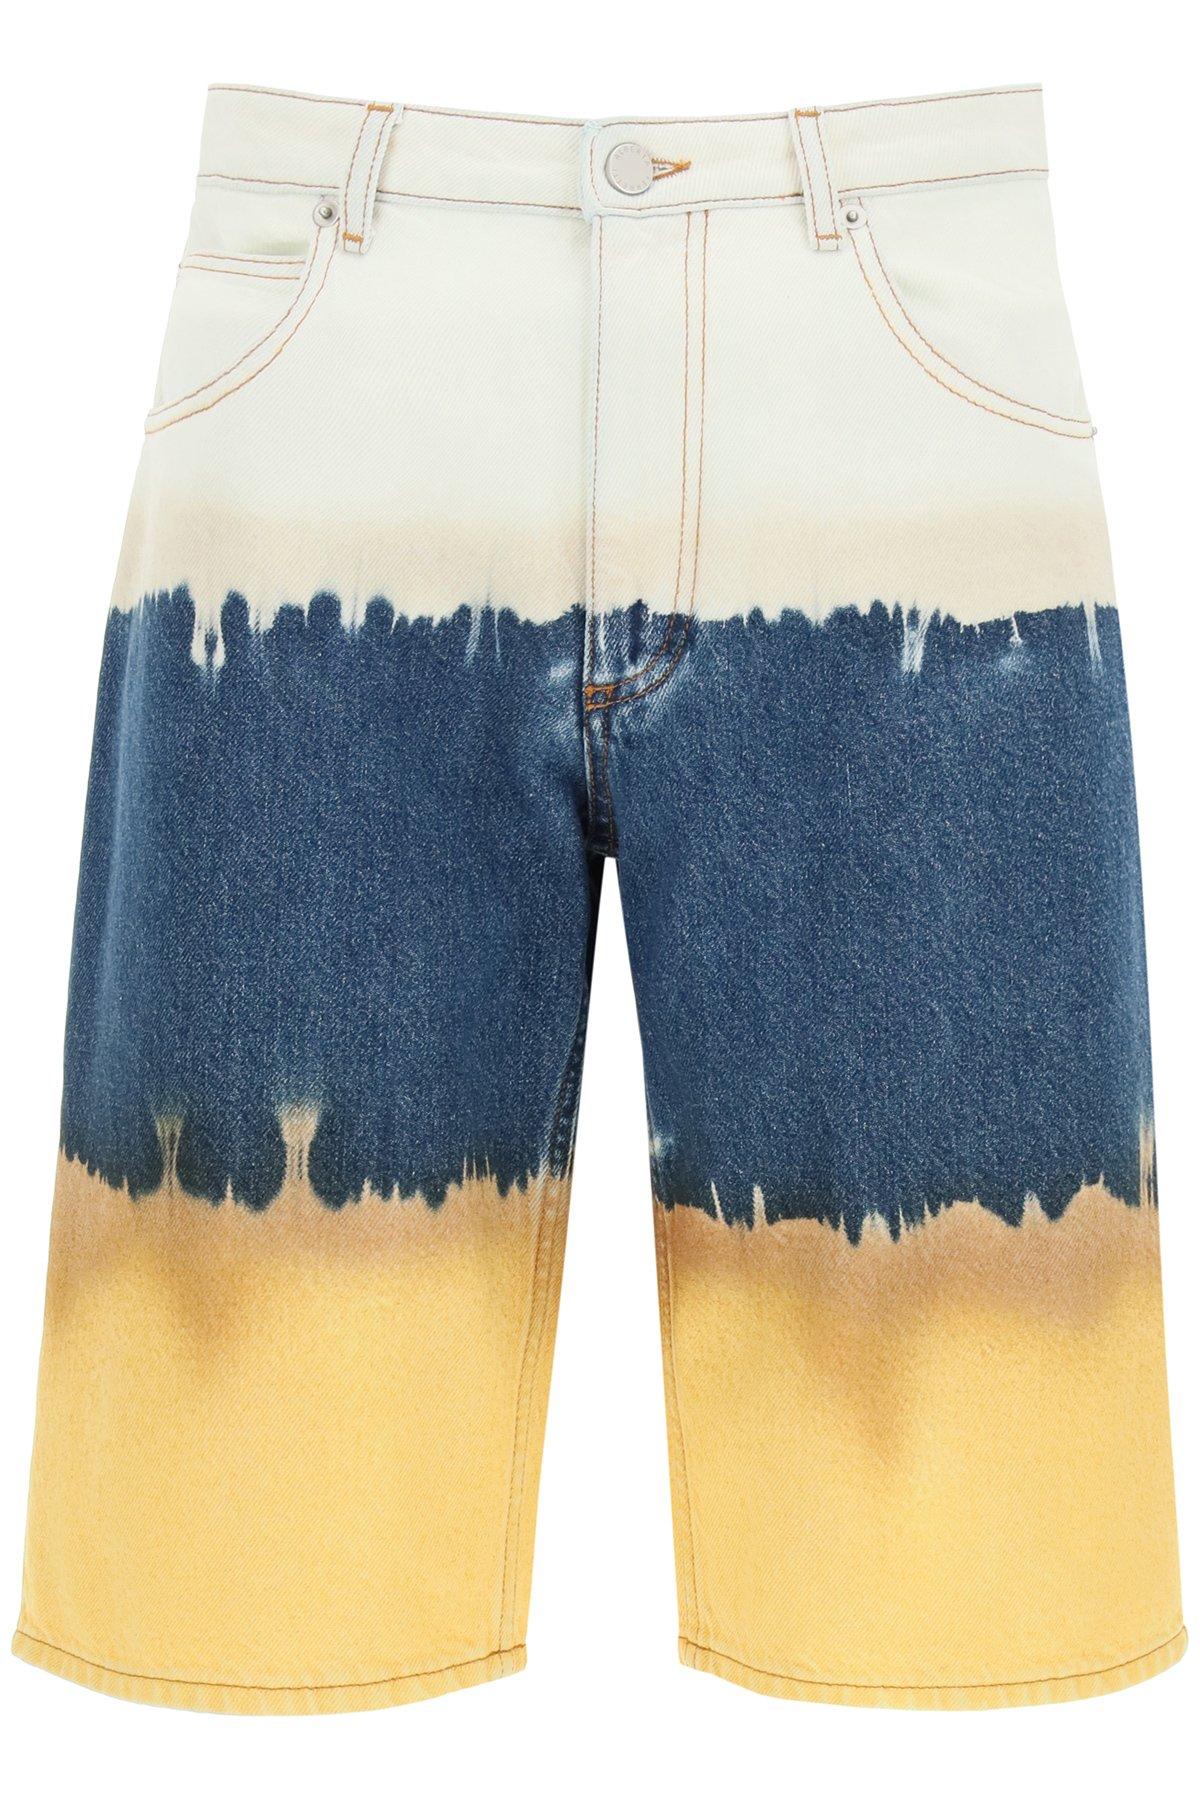 Alberta ferretti bermuda tie-dye i love summer